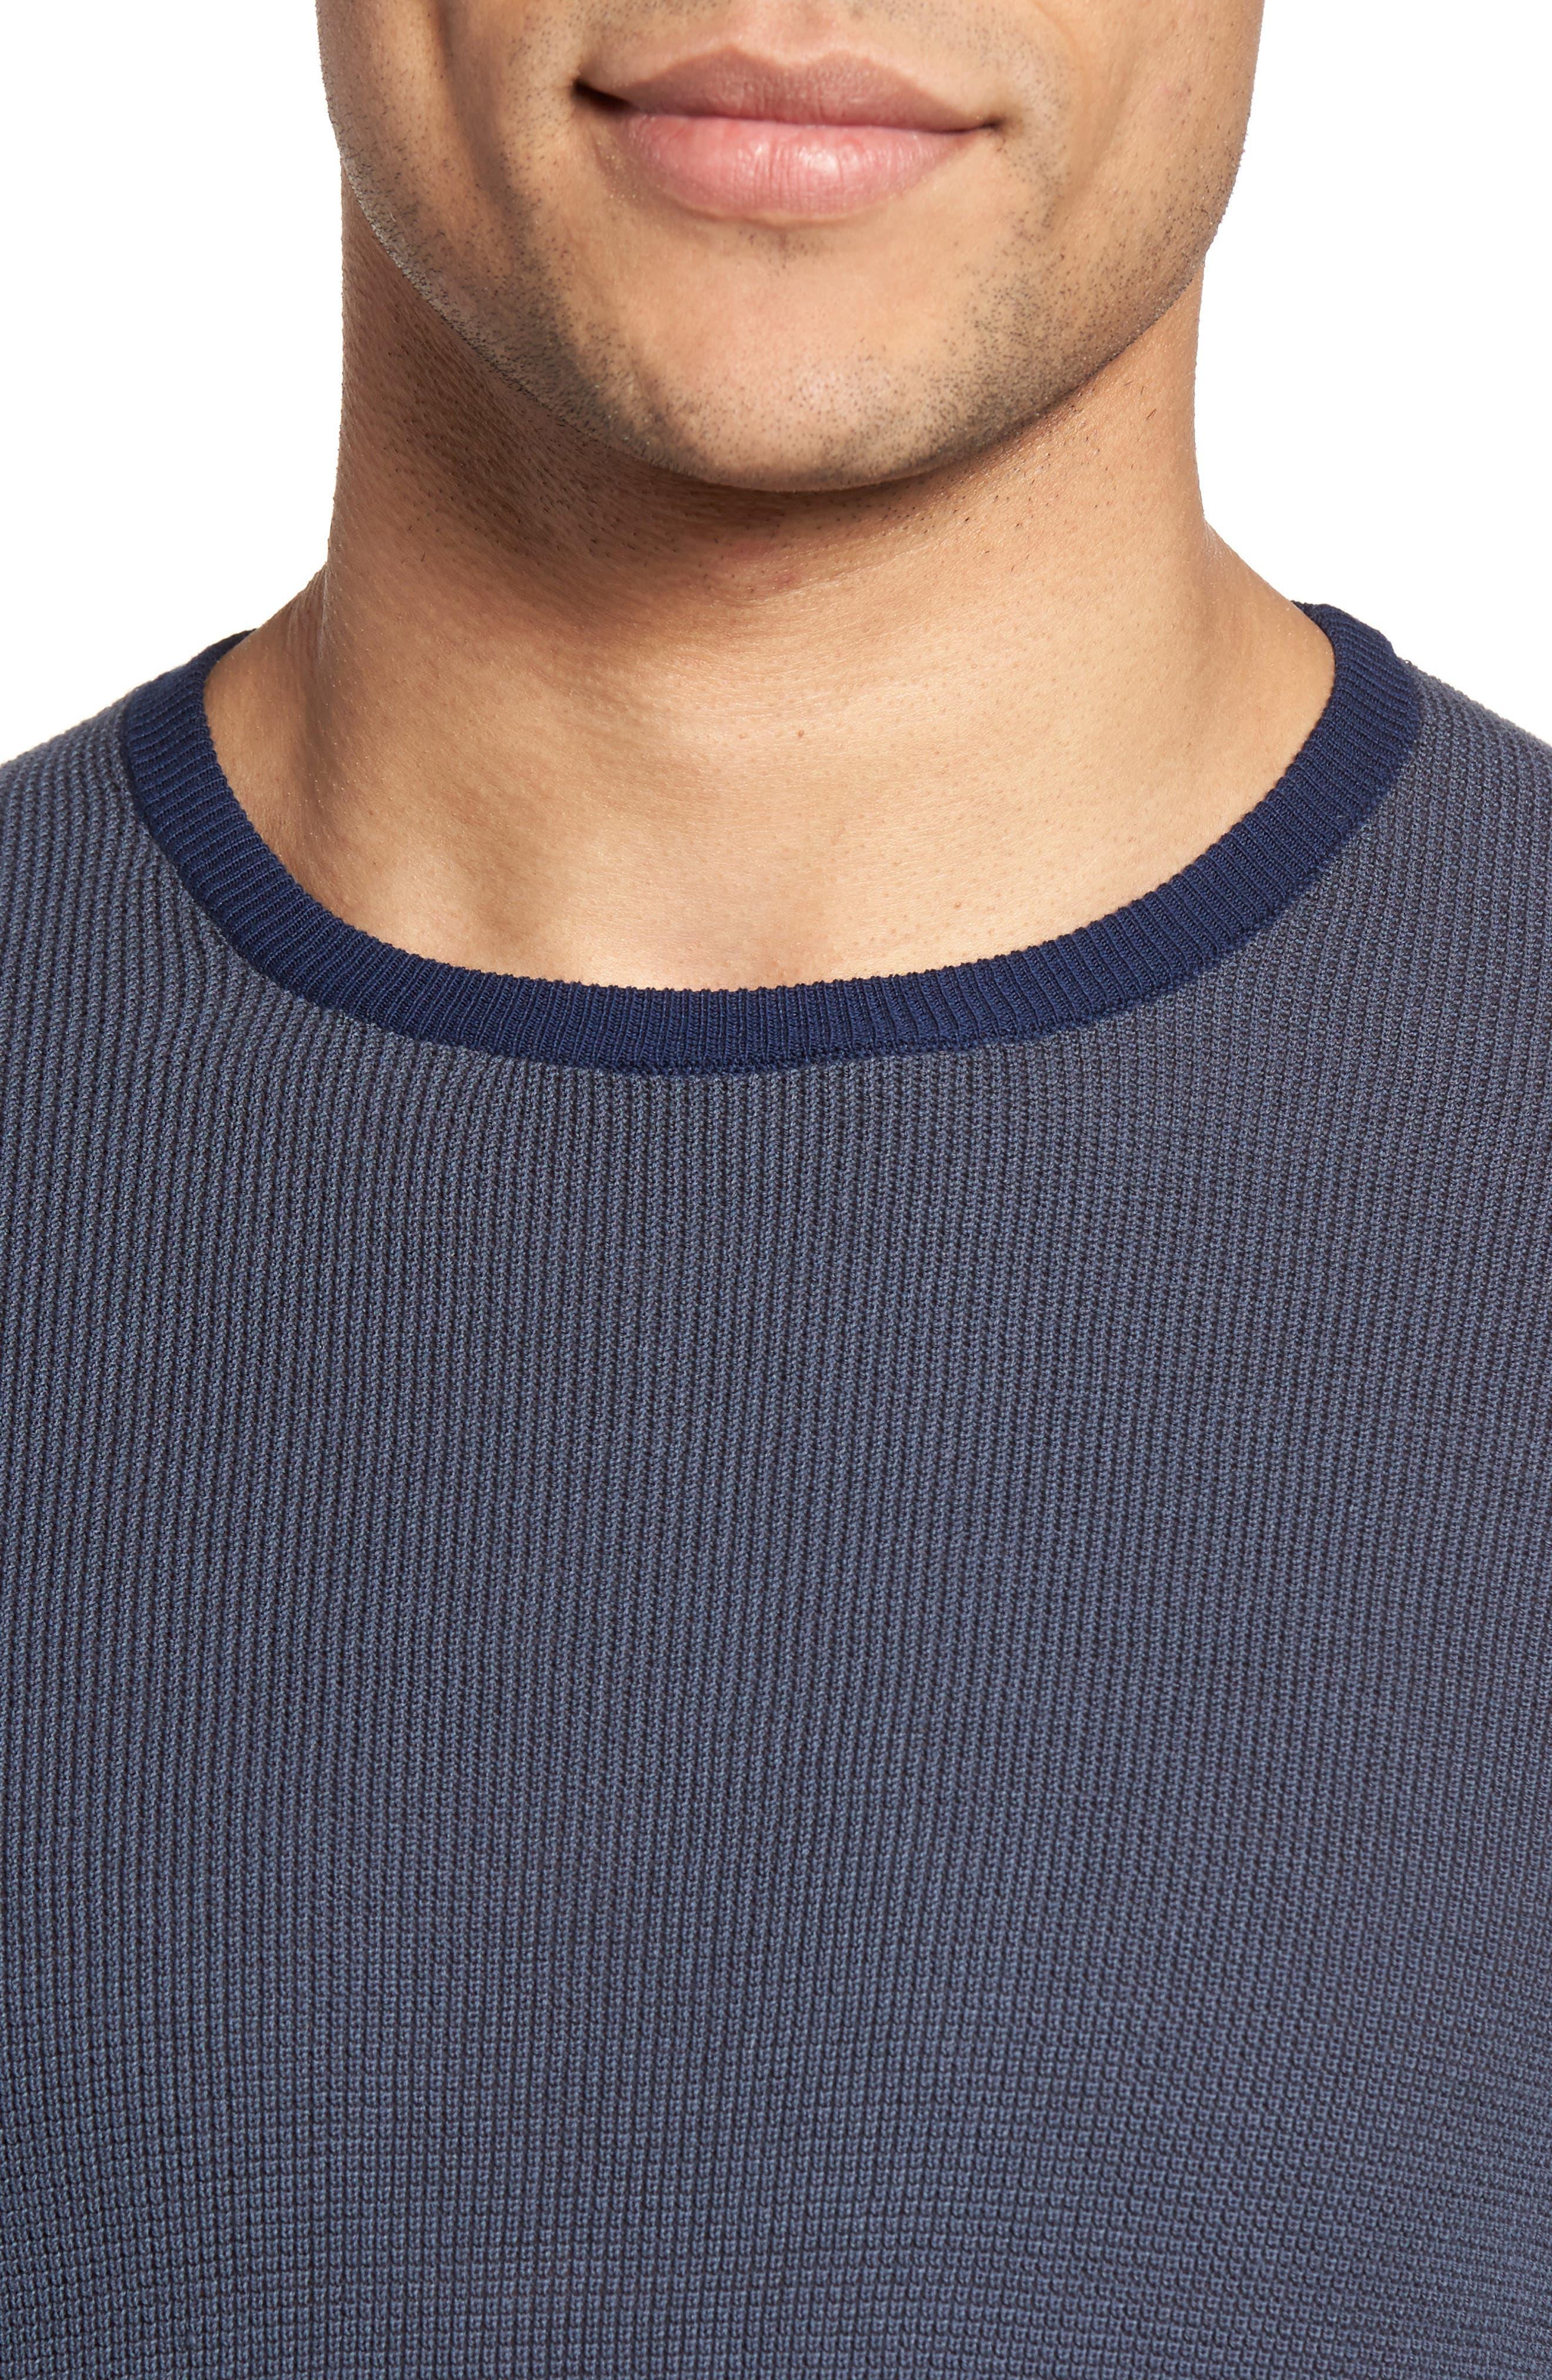 Boxwood Sweater,                             Alternate thumbnail 4, color,                             Ocean